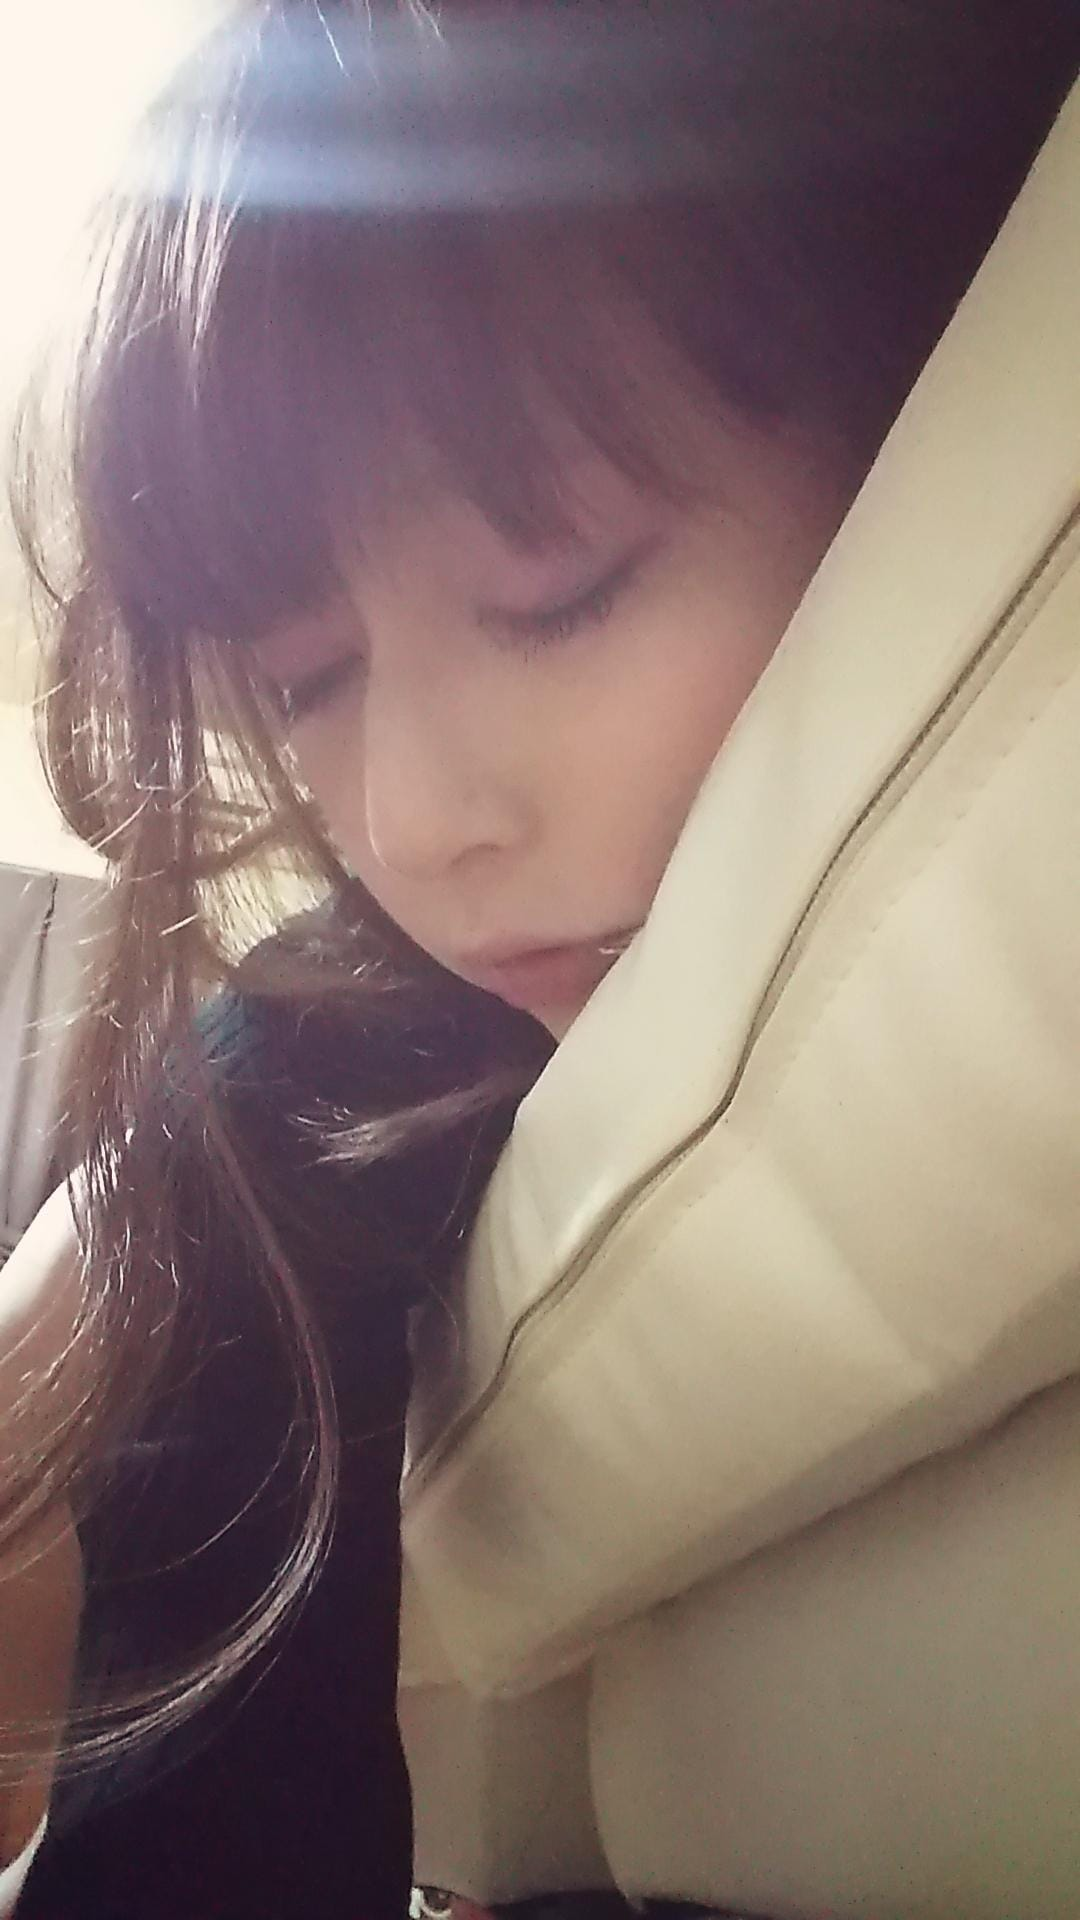 RINA【りな】「効率化を極める」05/19(土) 14:51 | RINA【りな】の写メ・風俗動画